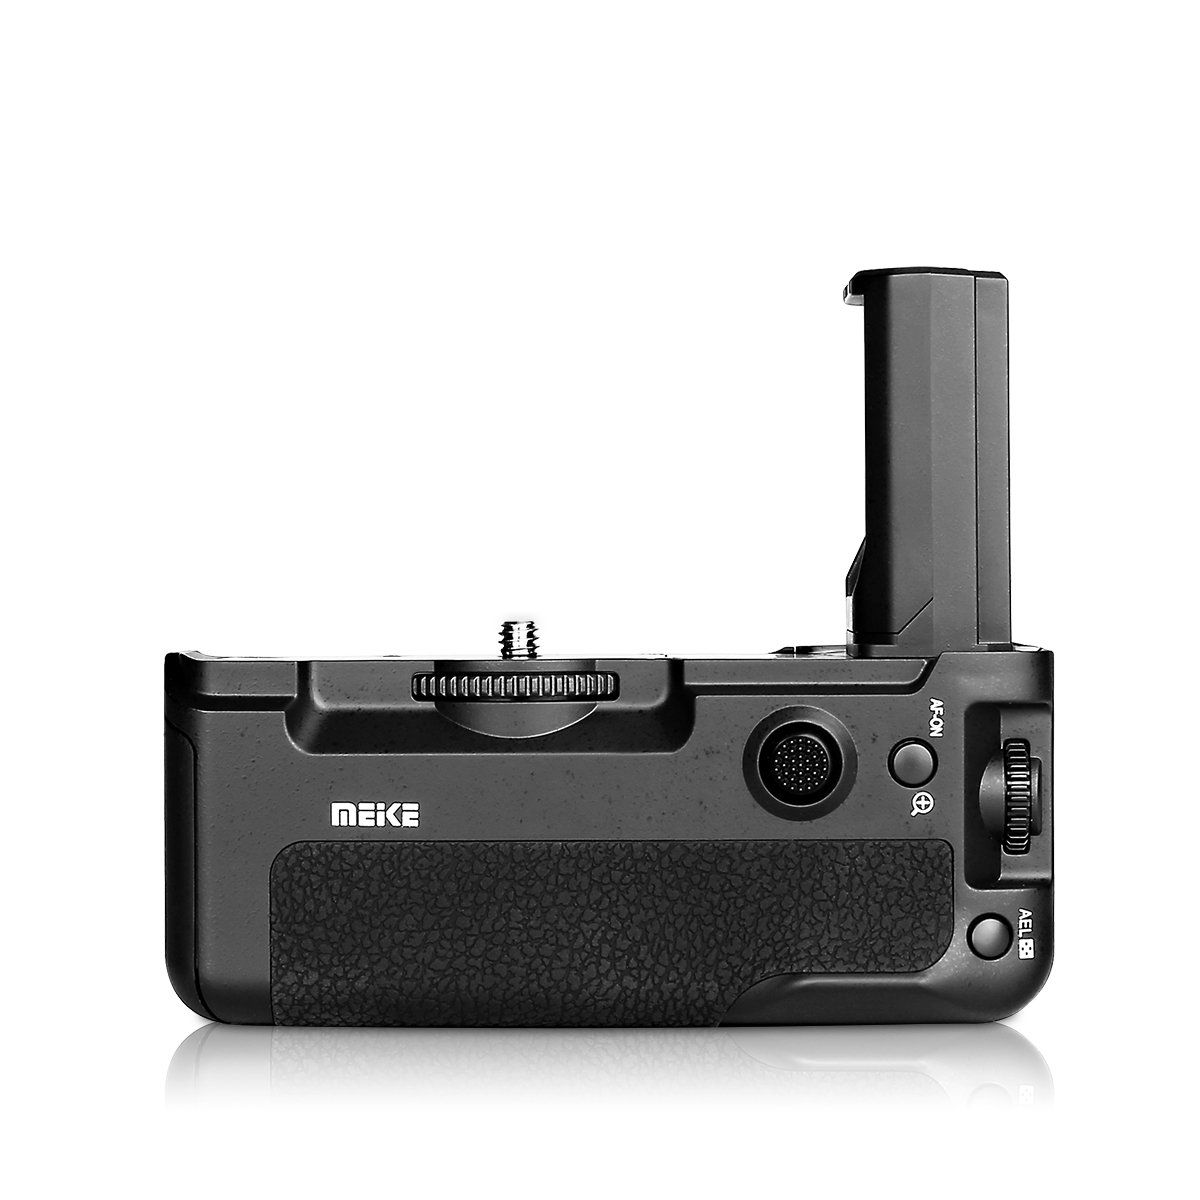 Meike MK A9 Professional Vertical Battery Grip for Sony A9 A7RIII A7III Camera by Meike